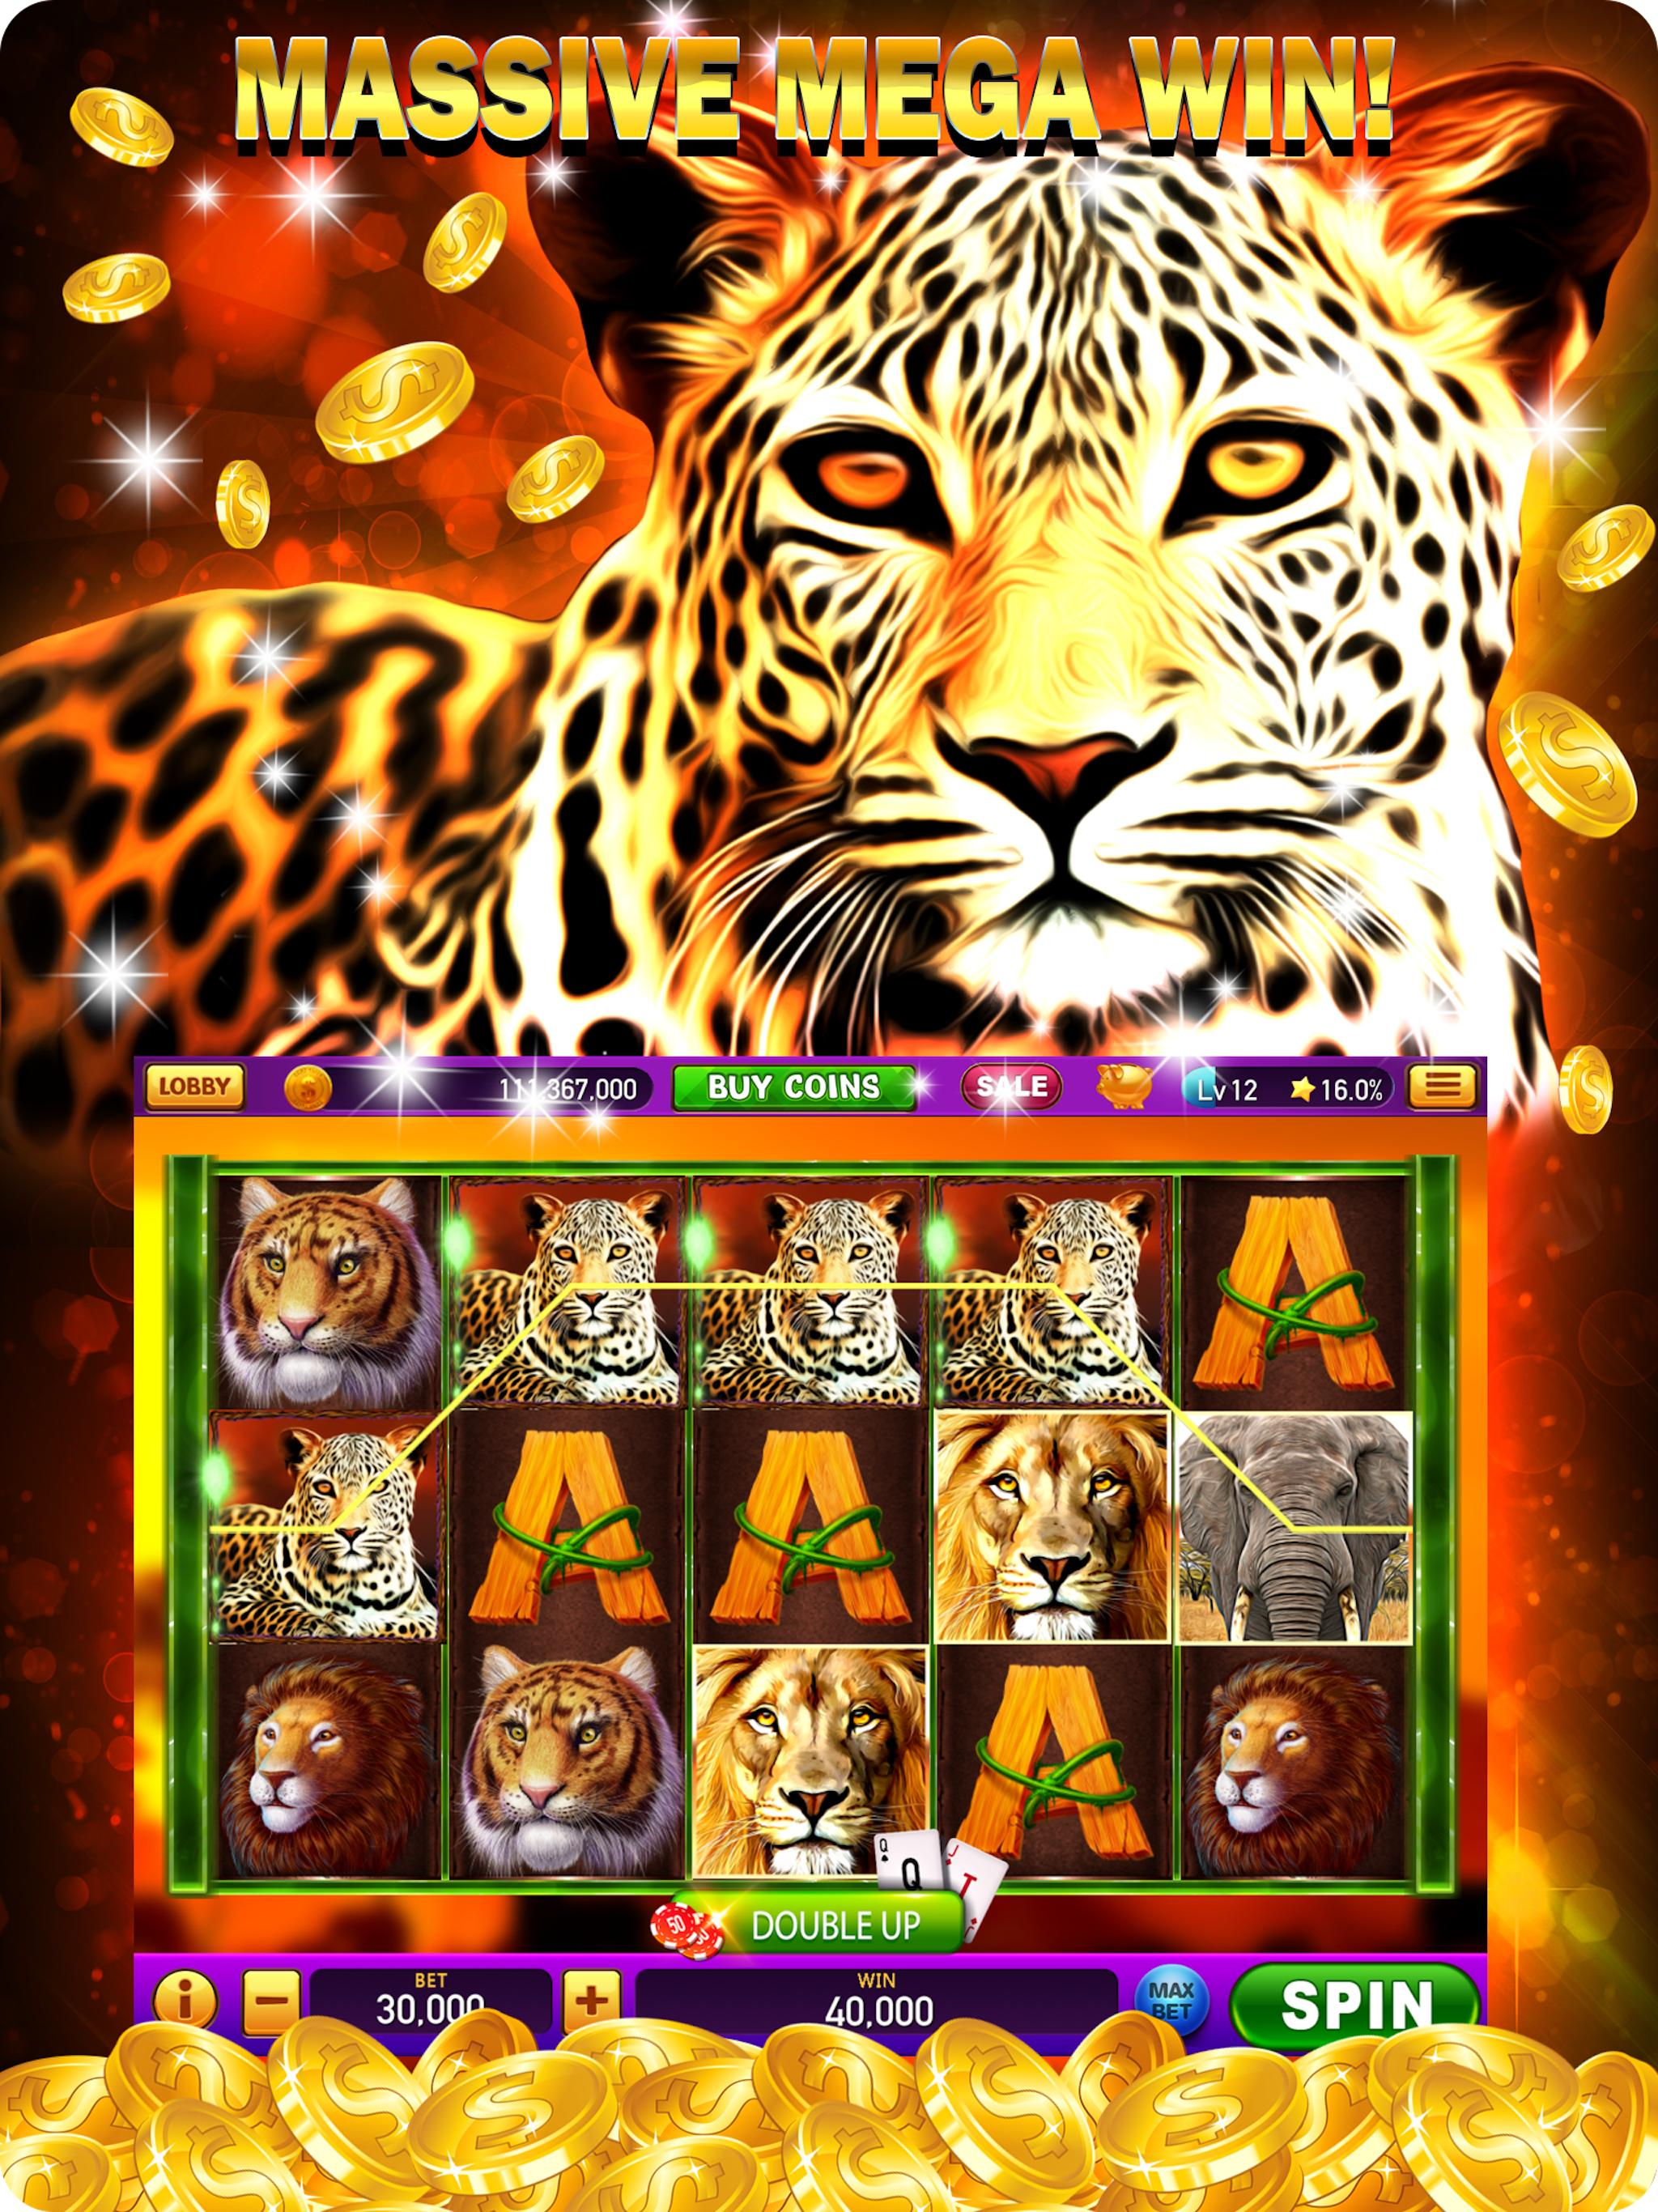 Club player casino mama bonus